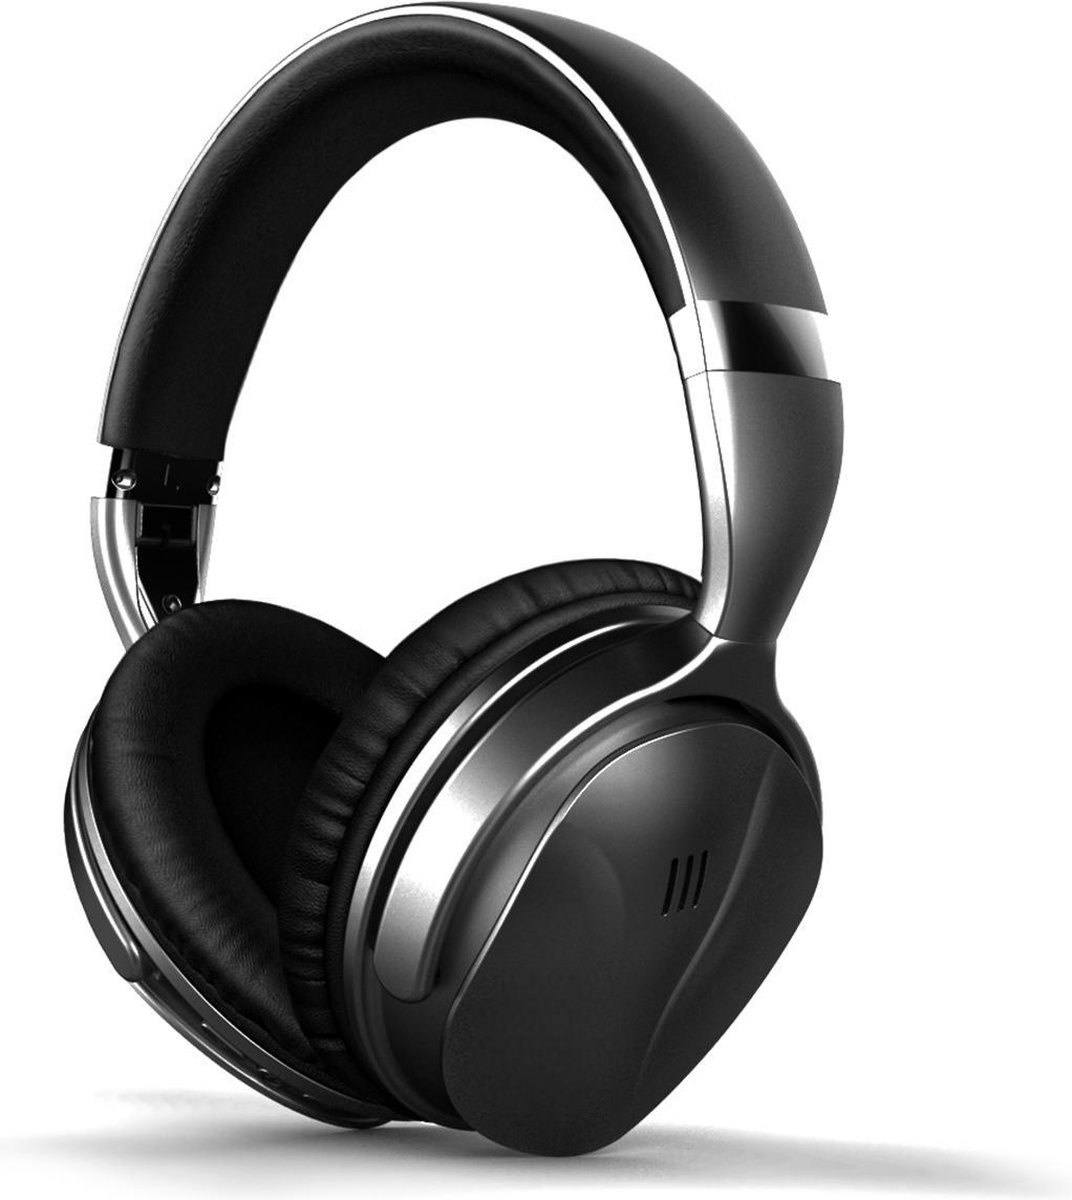 YONO Noise Cancelling Hoofdtelefoon ANC80 – Over-Ear Koptelefoon Bluetooth – Draadloos – Zwart